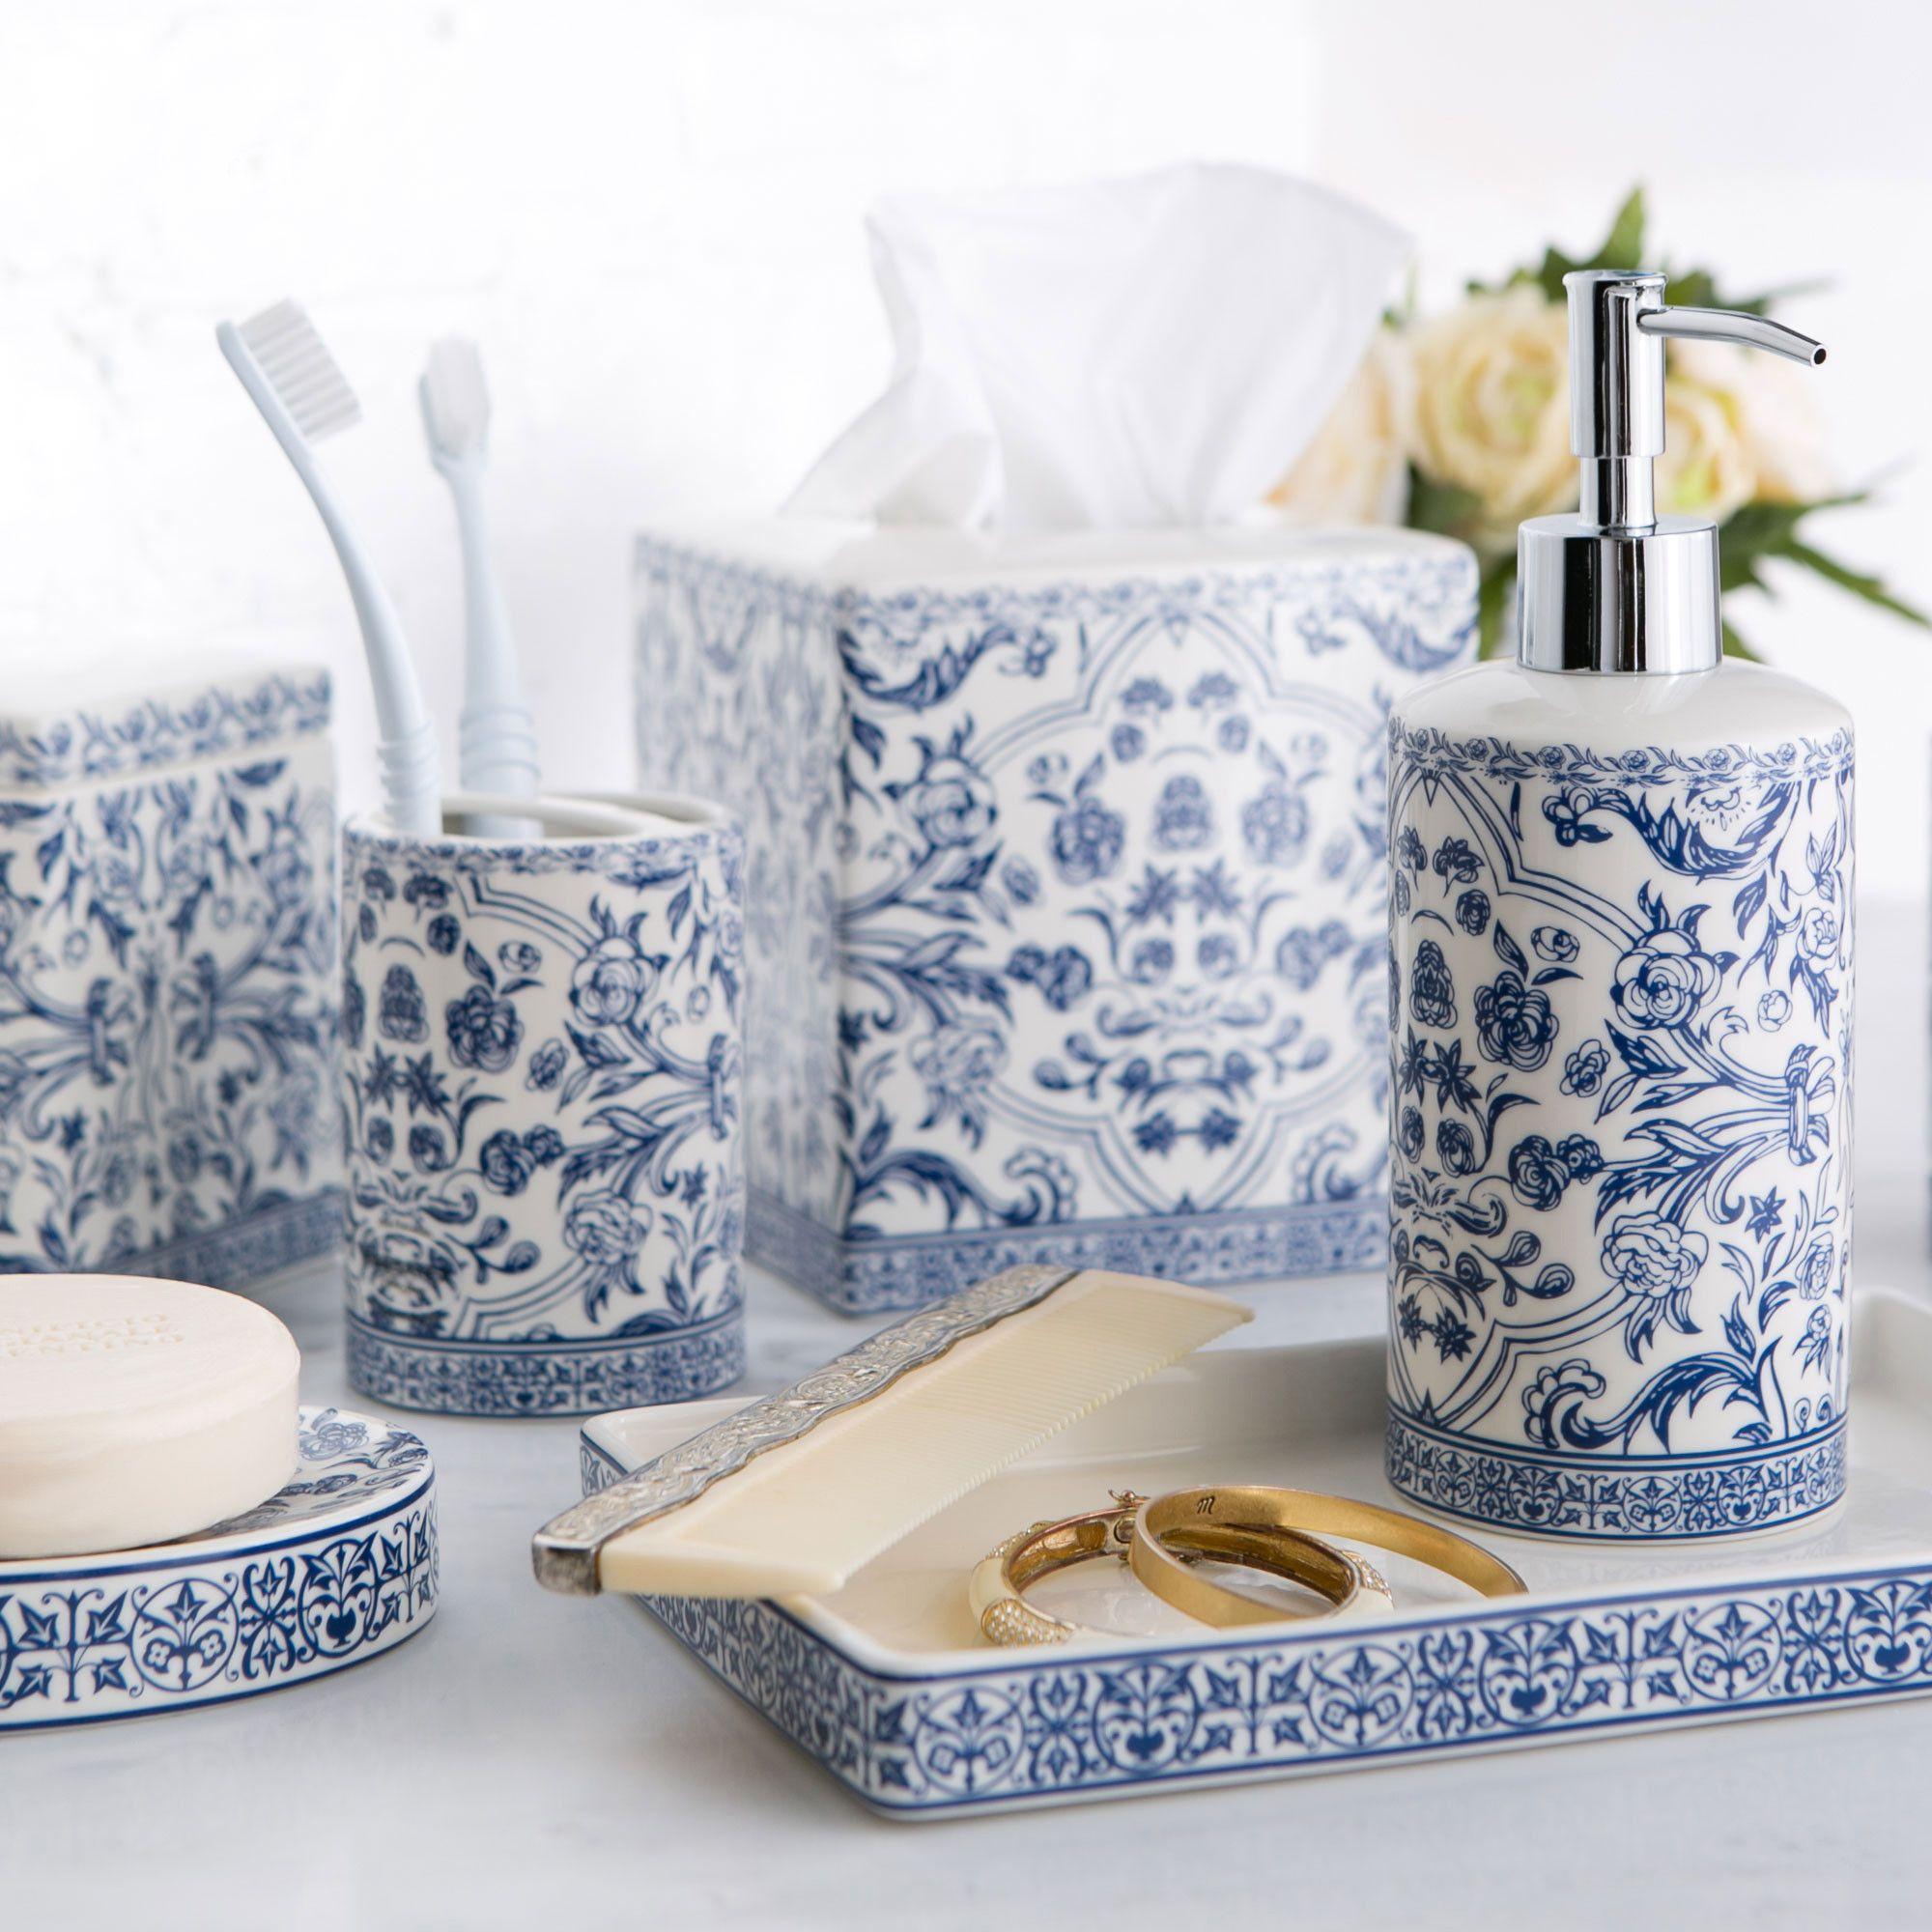 Birch Lane Porcelain Collection, Blue & White & Reviews | Wayfair ...